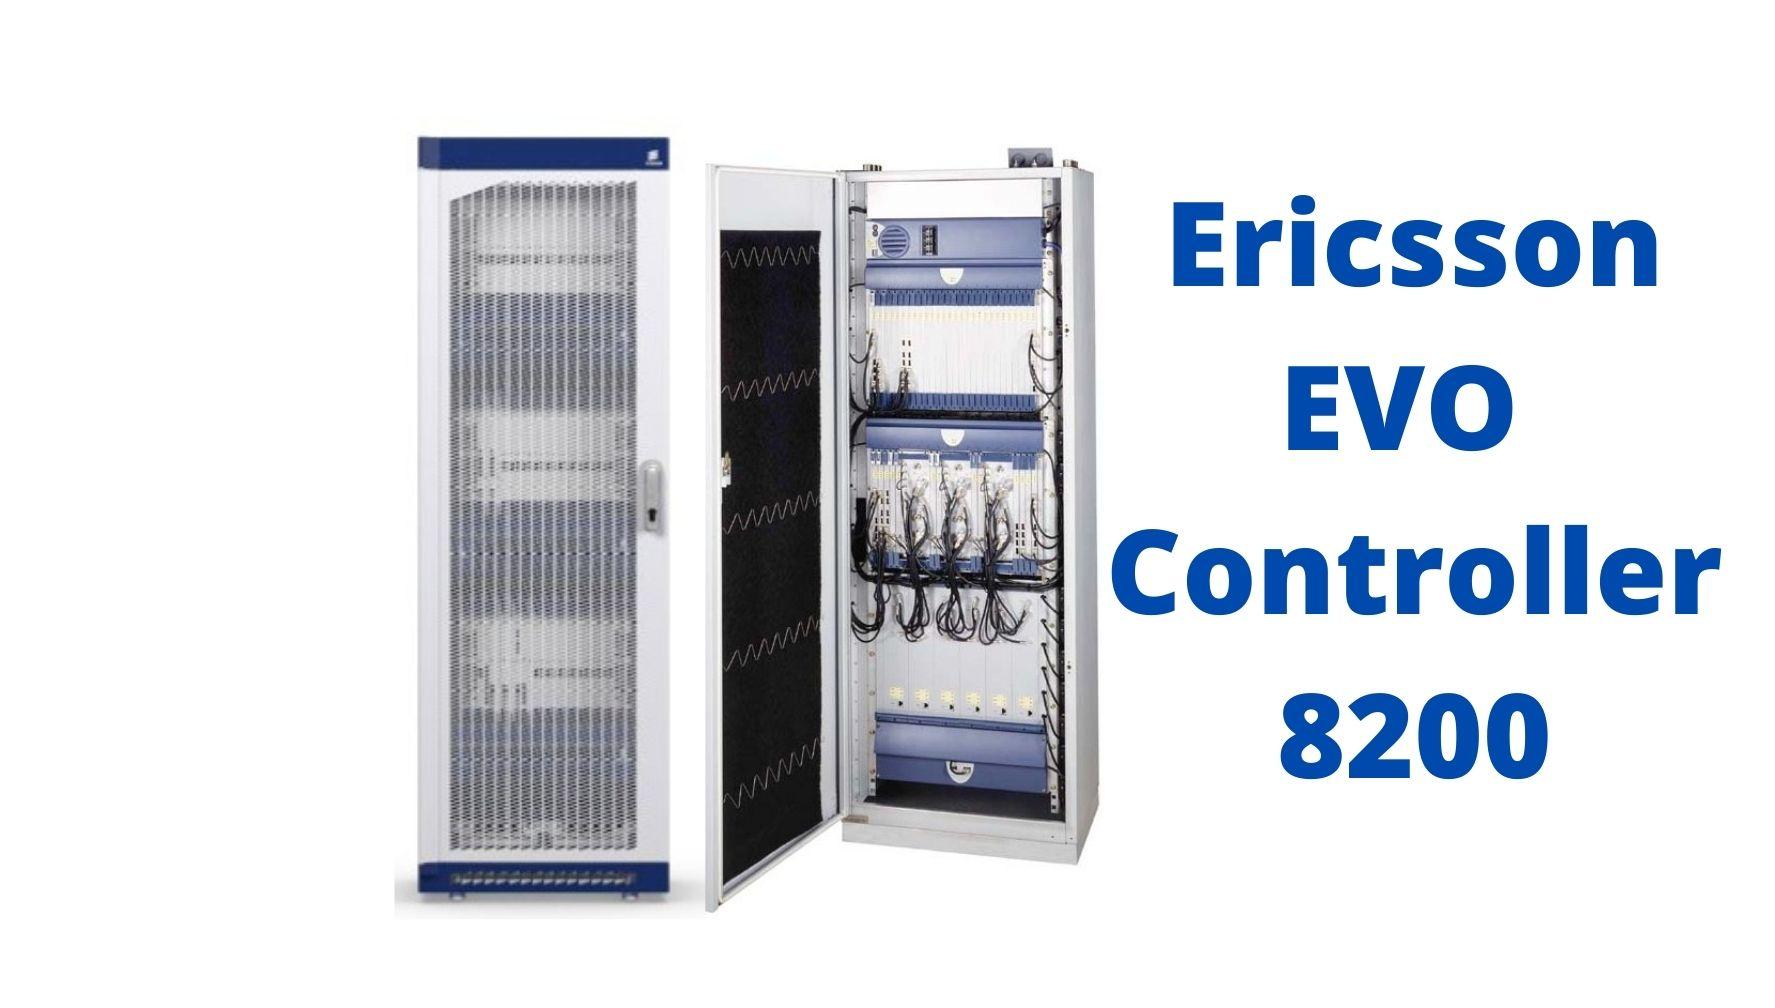 Ericsson EVO Controller 8200